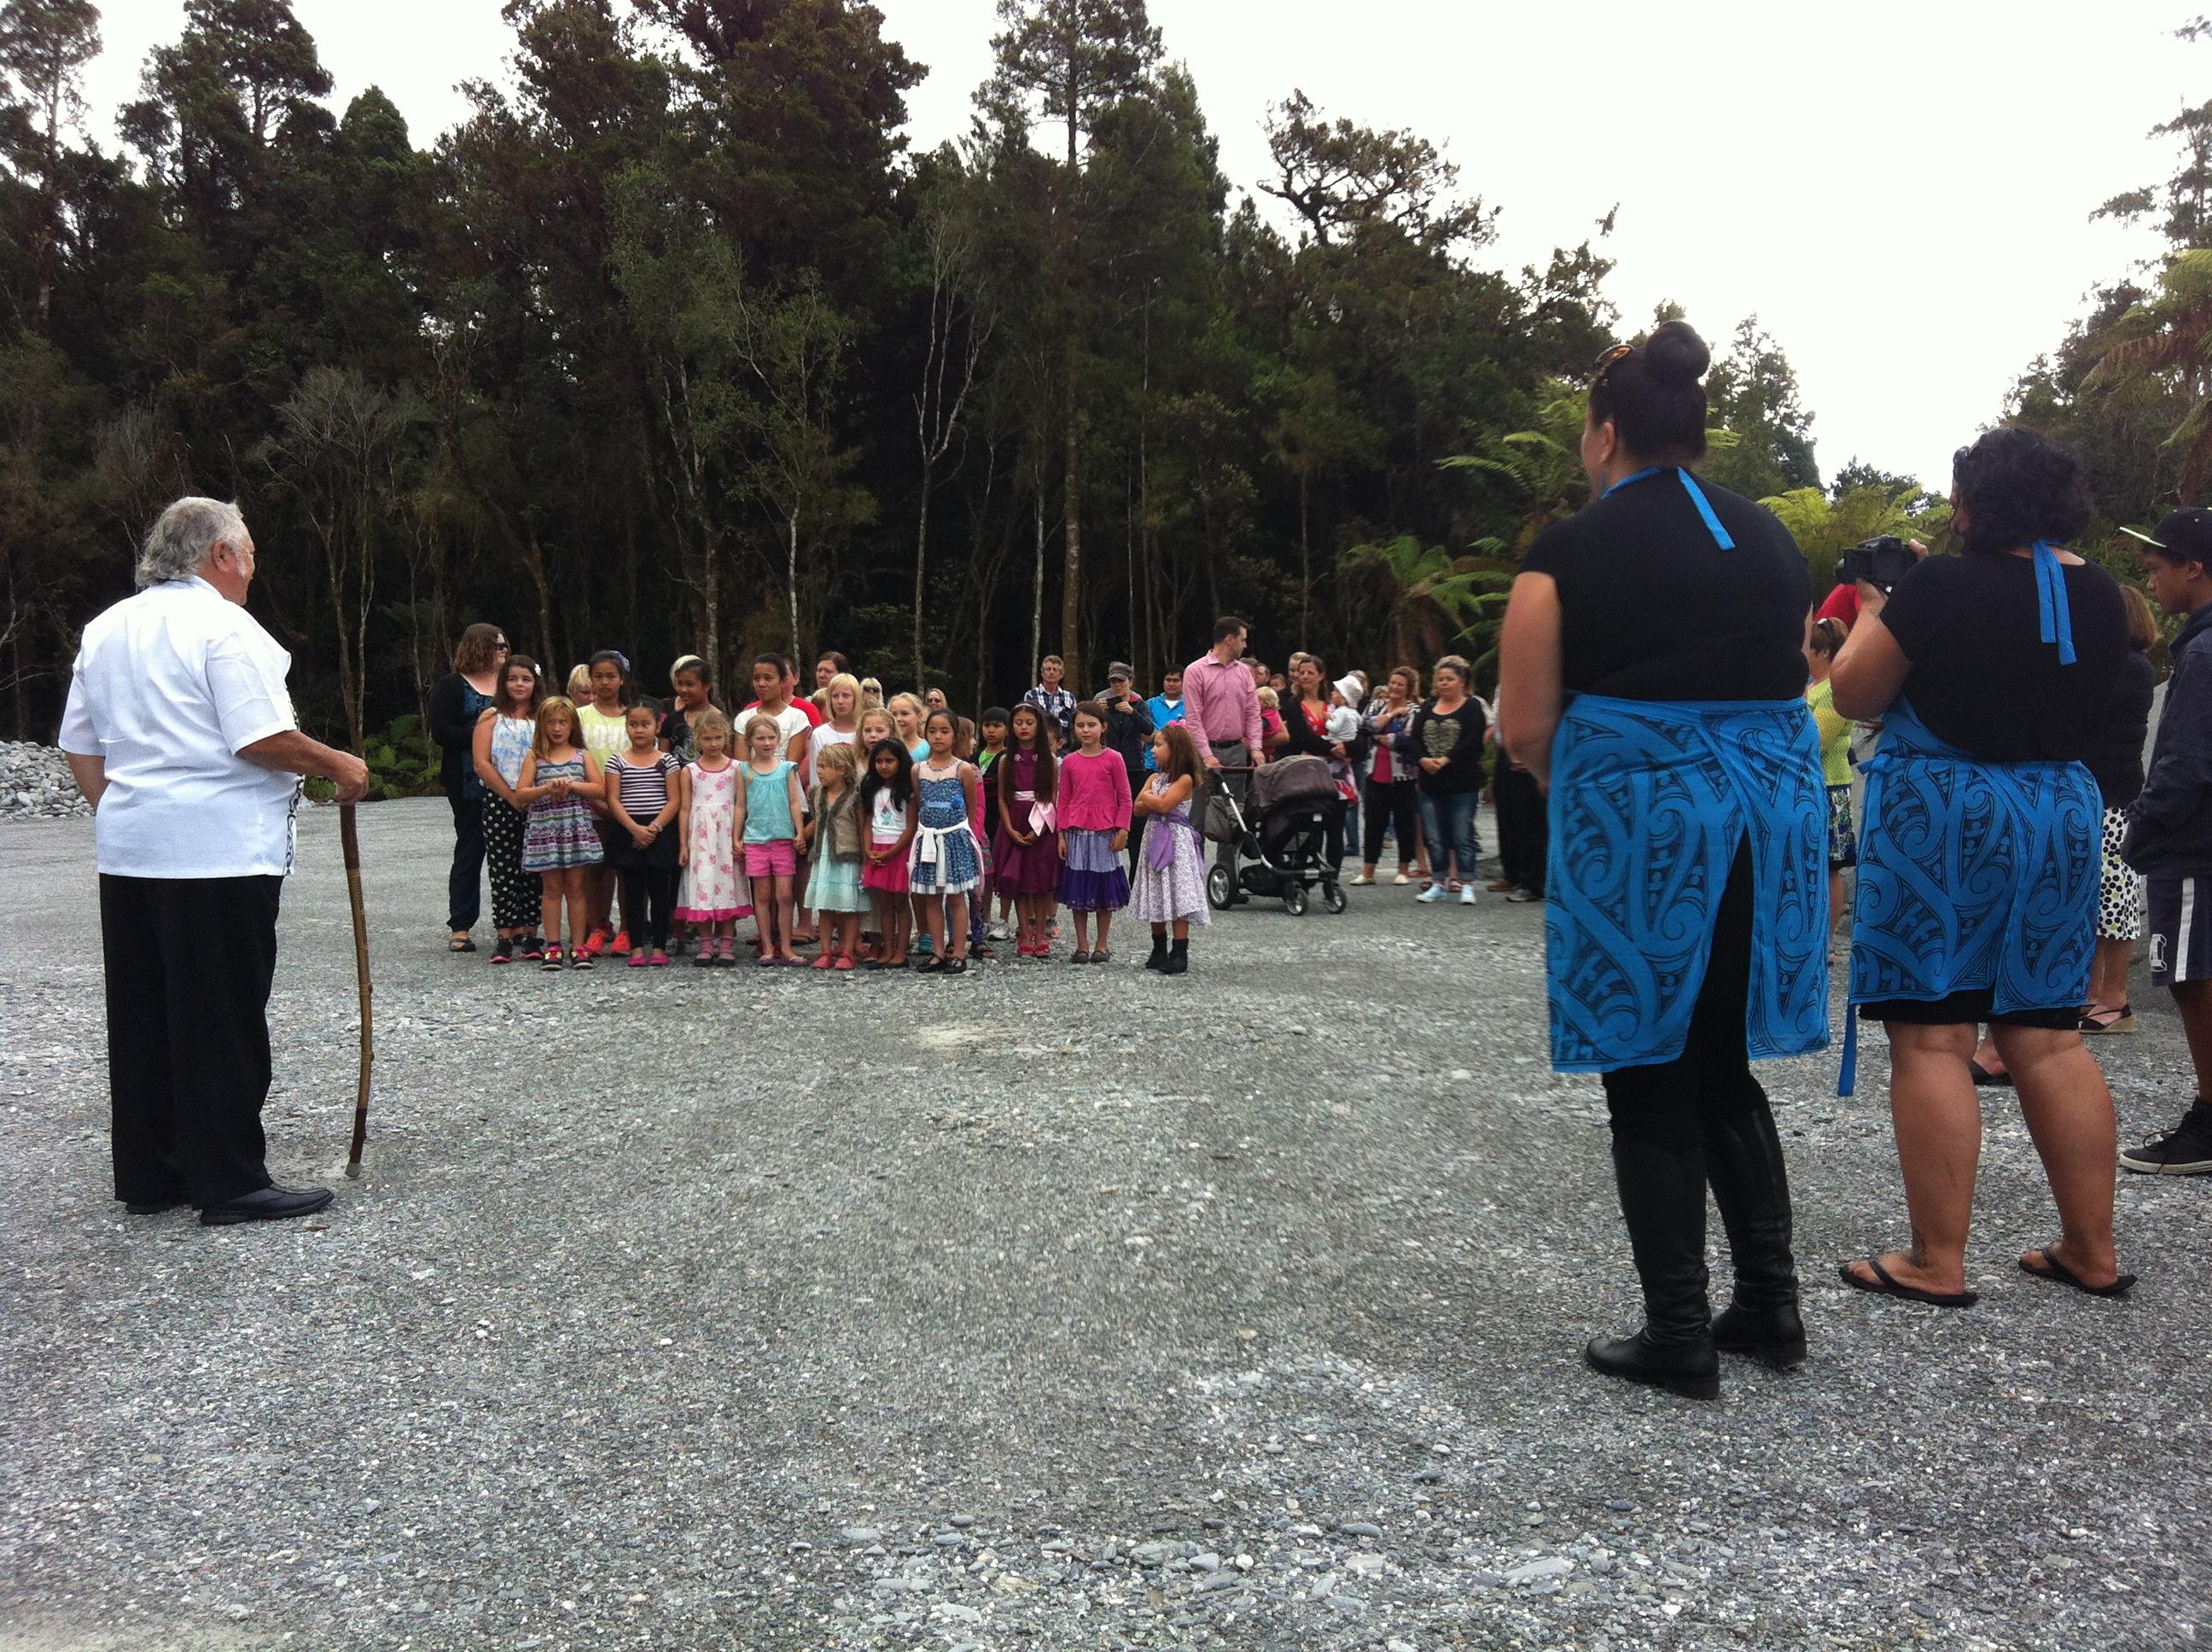 Franz Joseph School preparing to sing a waiata to Upoko Rūnanga, Richard Wallace, Tumuaki, Susan Wallace and kaiāwhina, Rachael Forsyth.